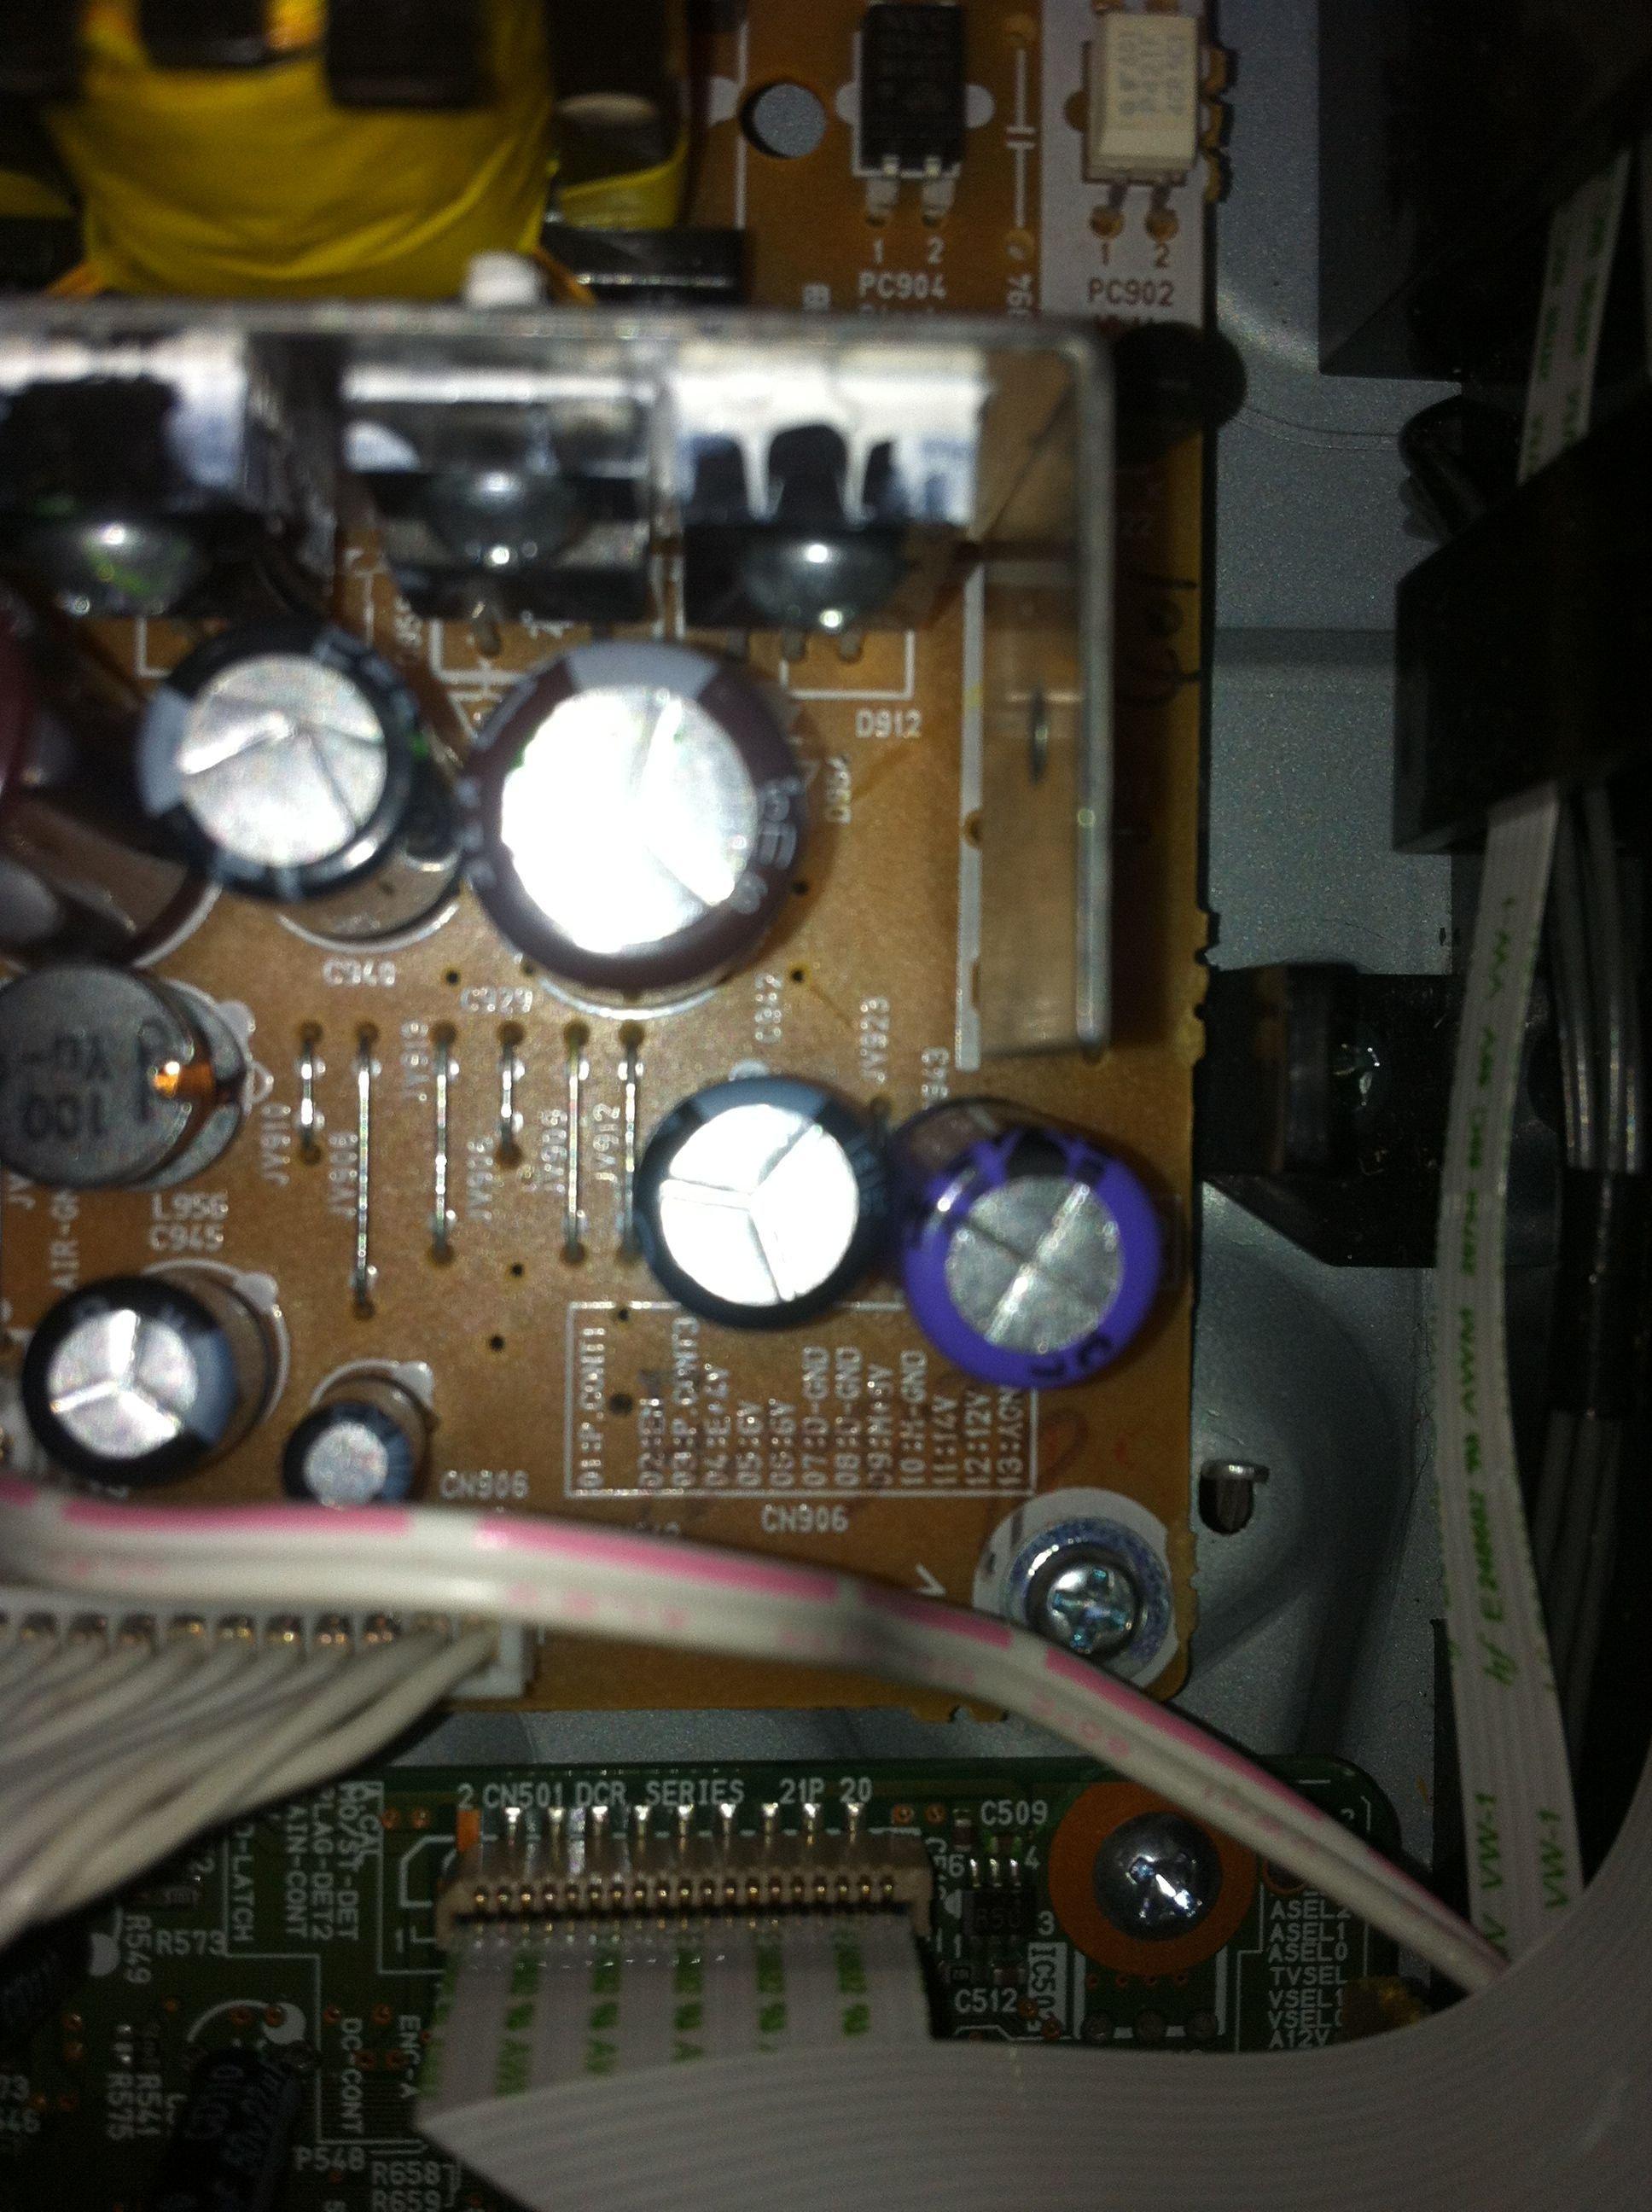 Sony Dav Hdx466 Push Power Protector Flashing On Display Avs